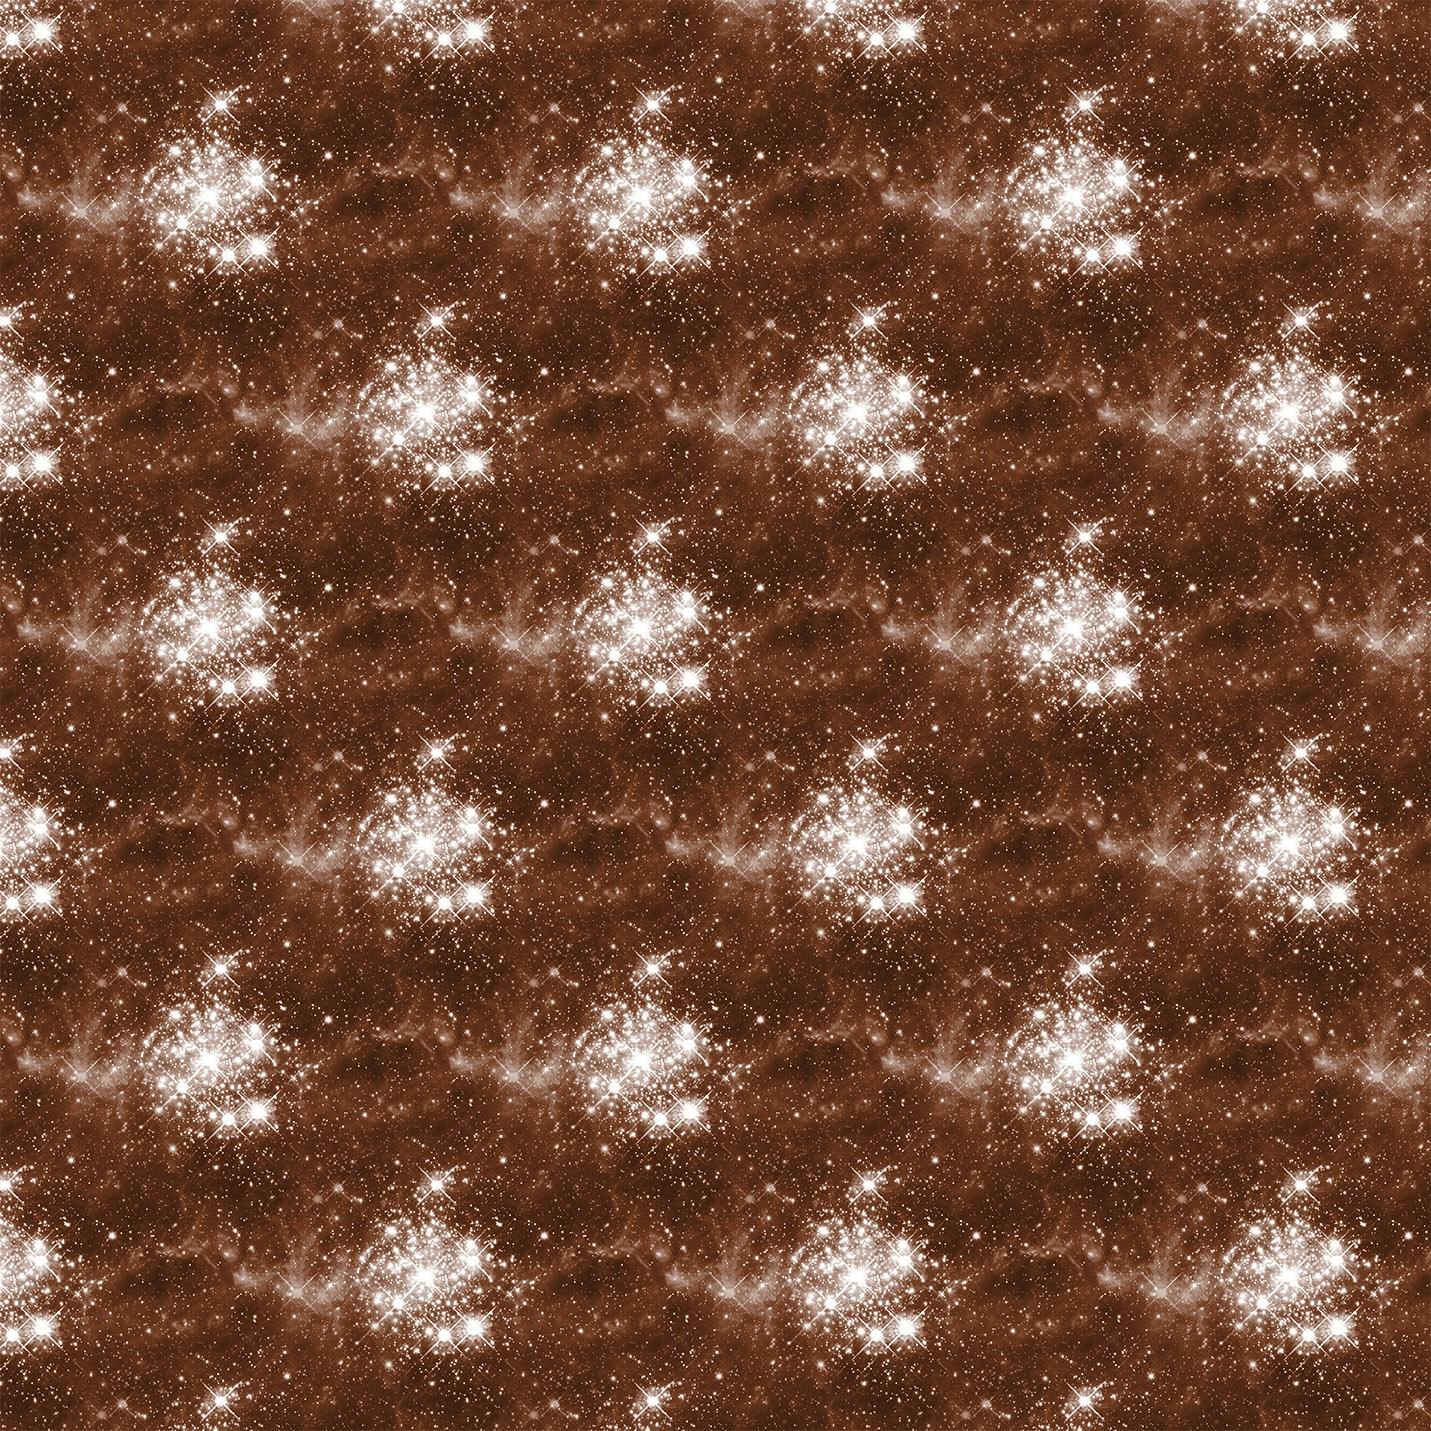 Brown sky galaxy print lycra- velvet- chiffon- scuba -mesh- jersey fabric- print to order - 4 way stretch fabric J282